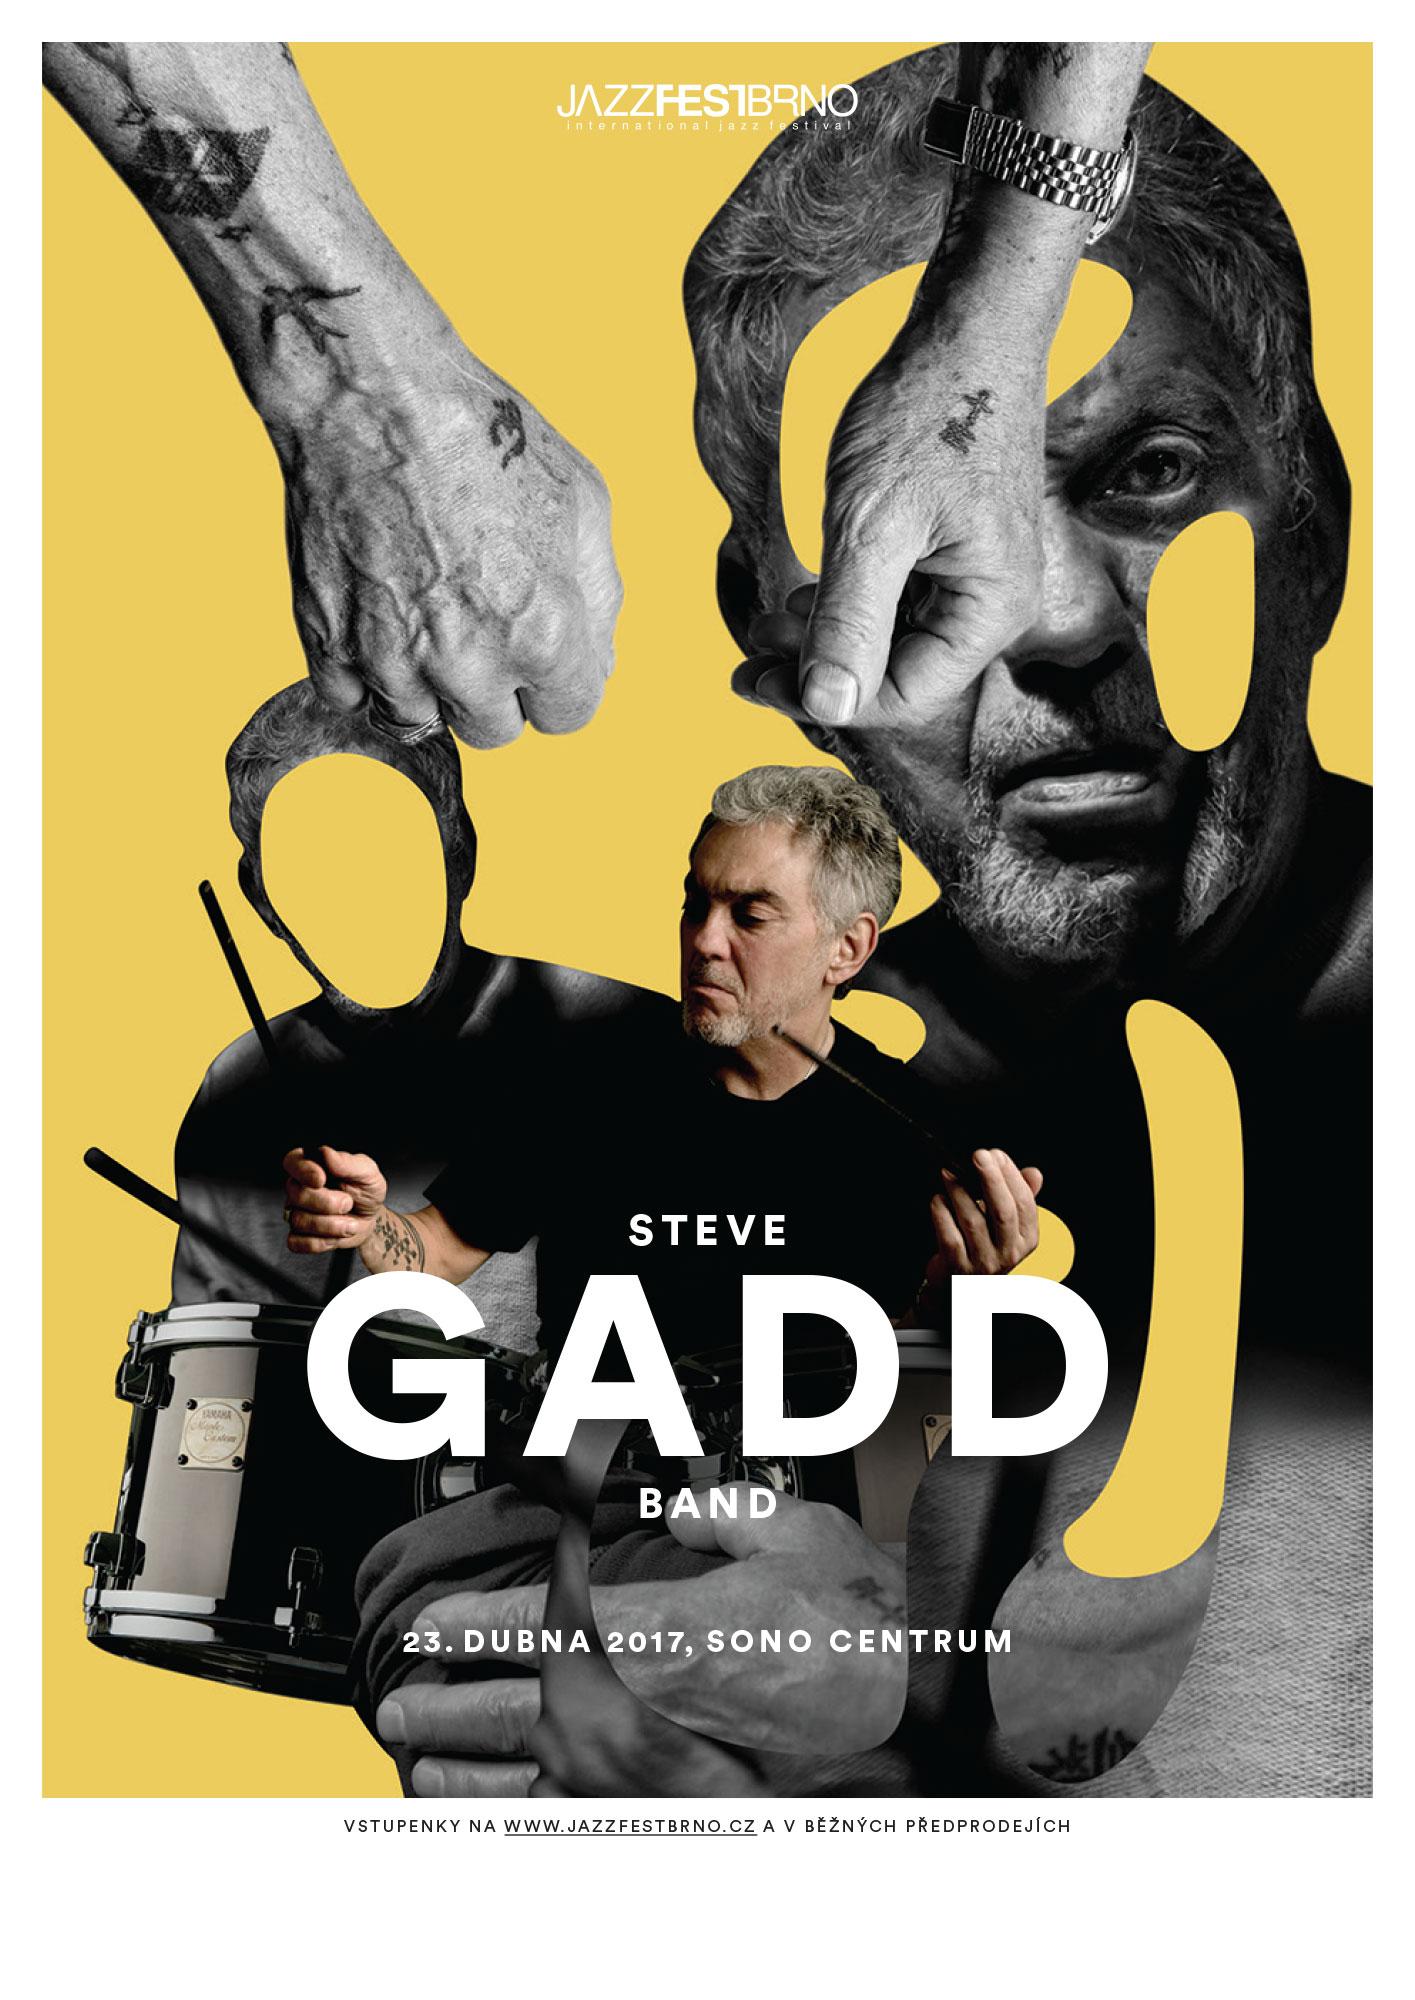 culture-JFB-2017-steve-gadd